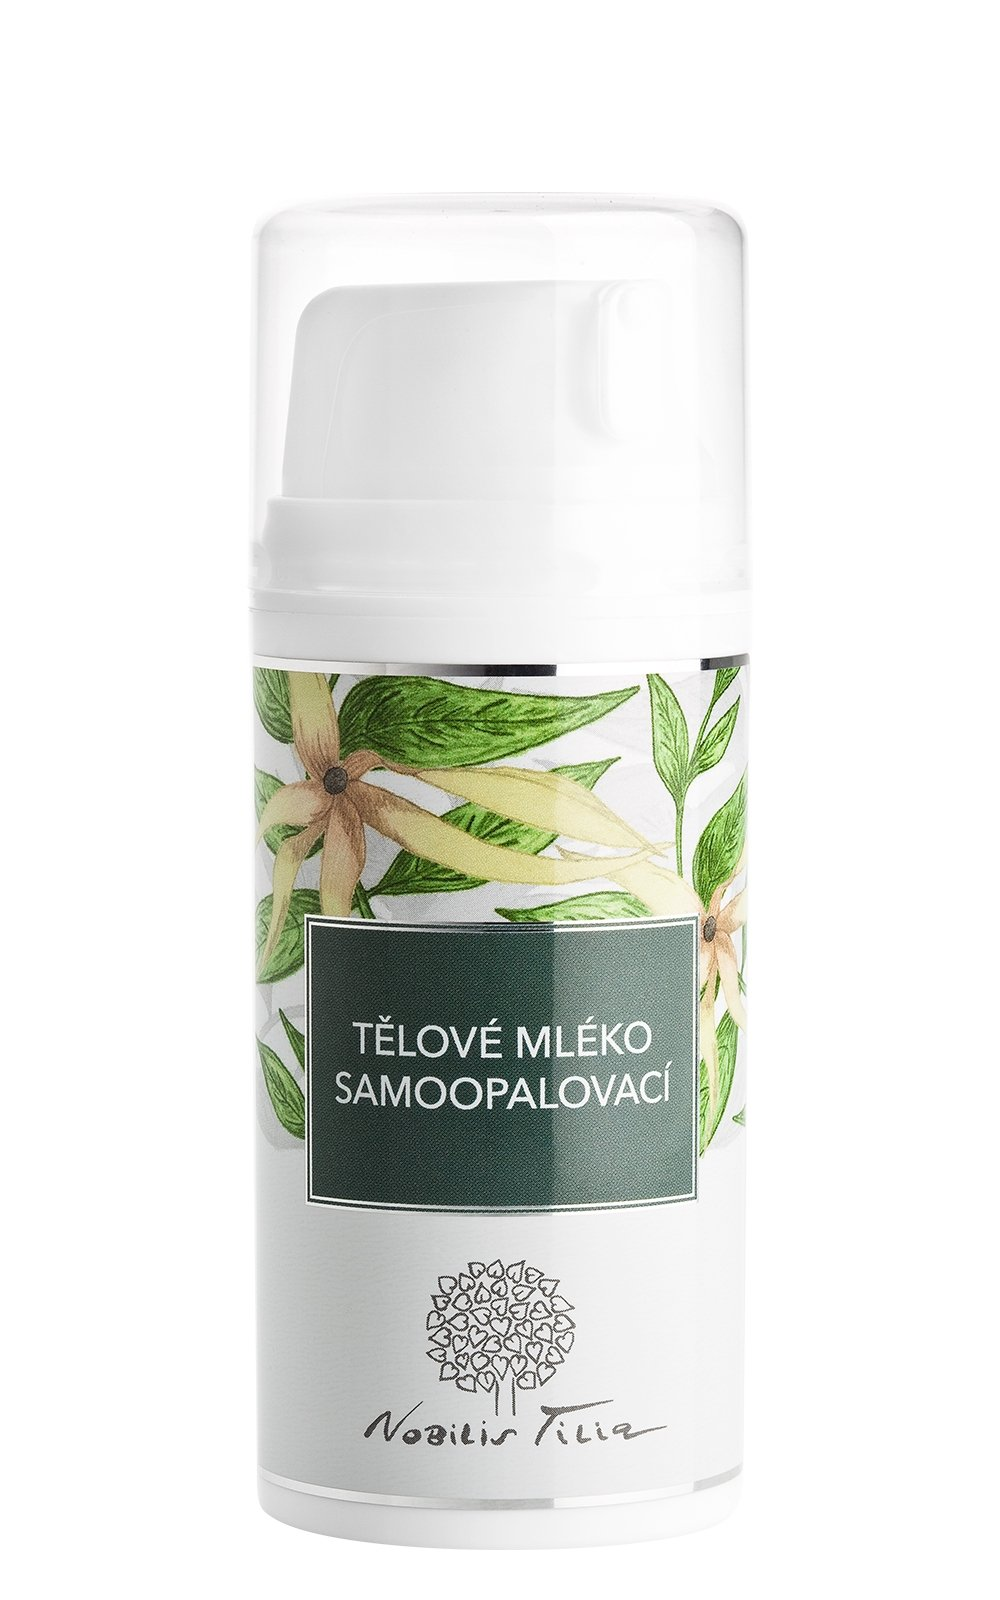 Nobilis Tilia Tělové mléko samoopalovací 100ml